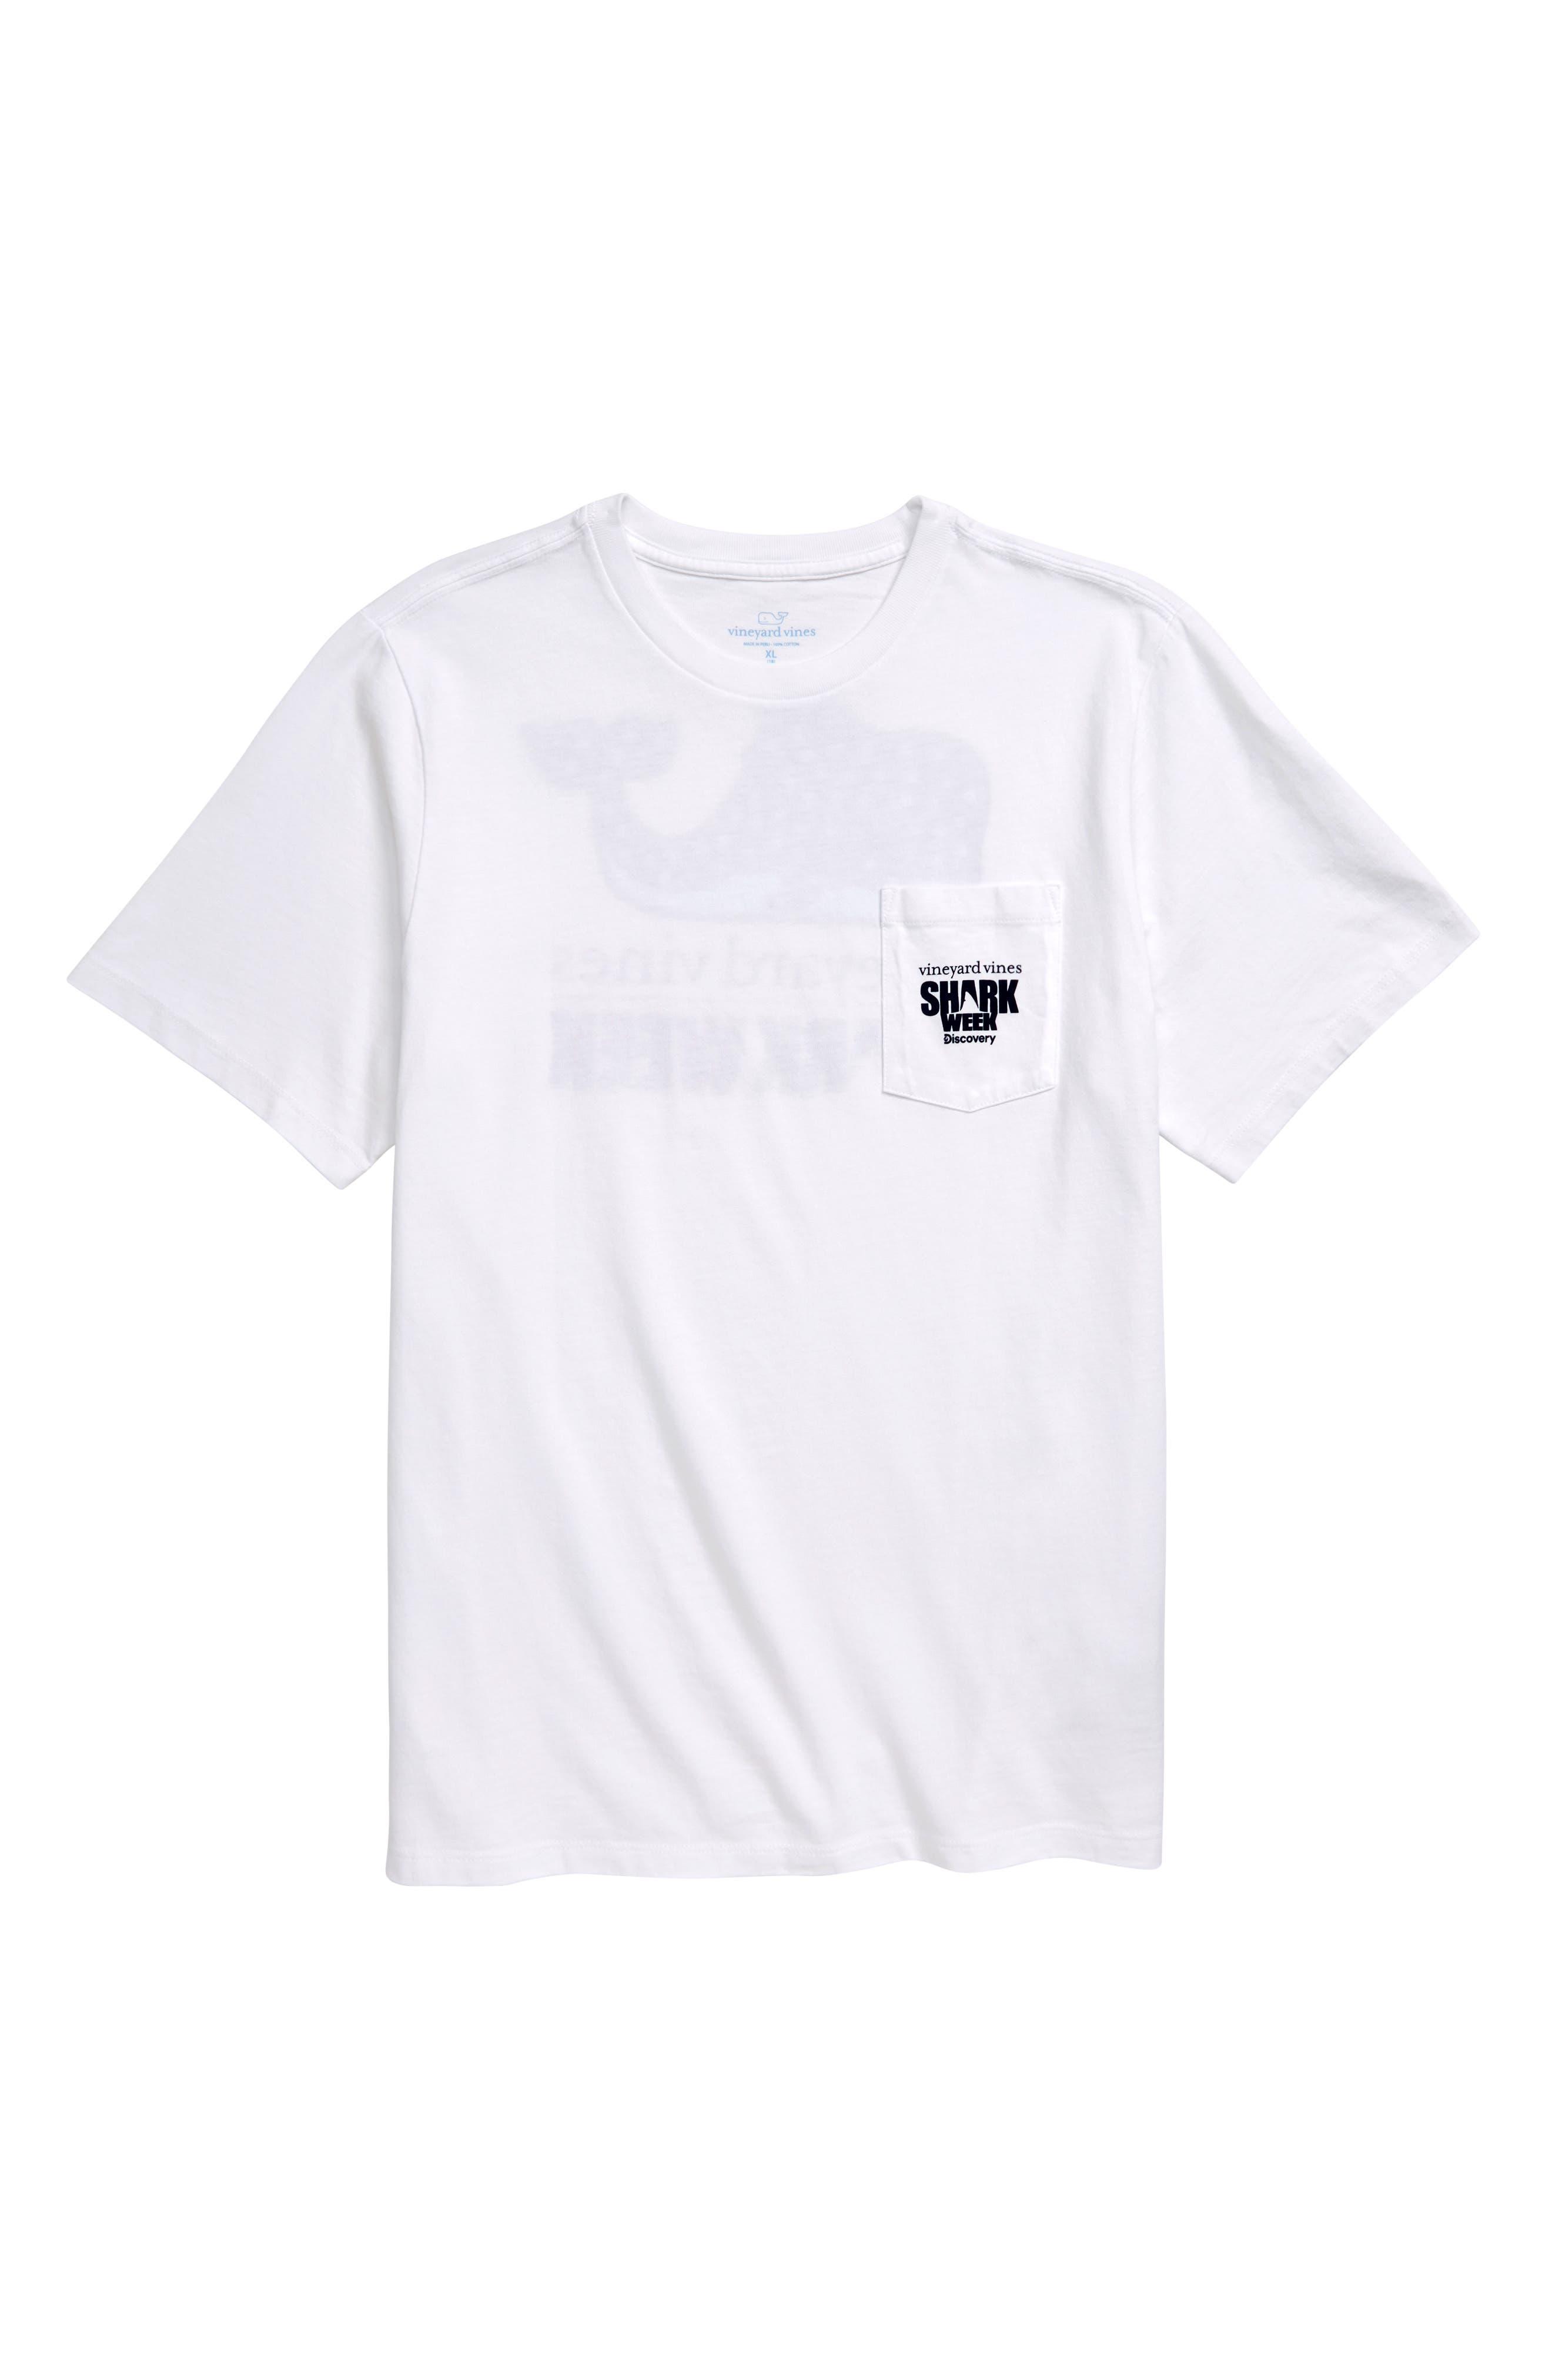 Toddler Boys Vineyard Vines X Shark Week(TM) Whale Shark Pocket TShirt Size 4T  White